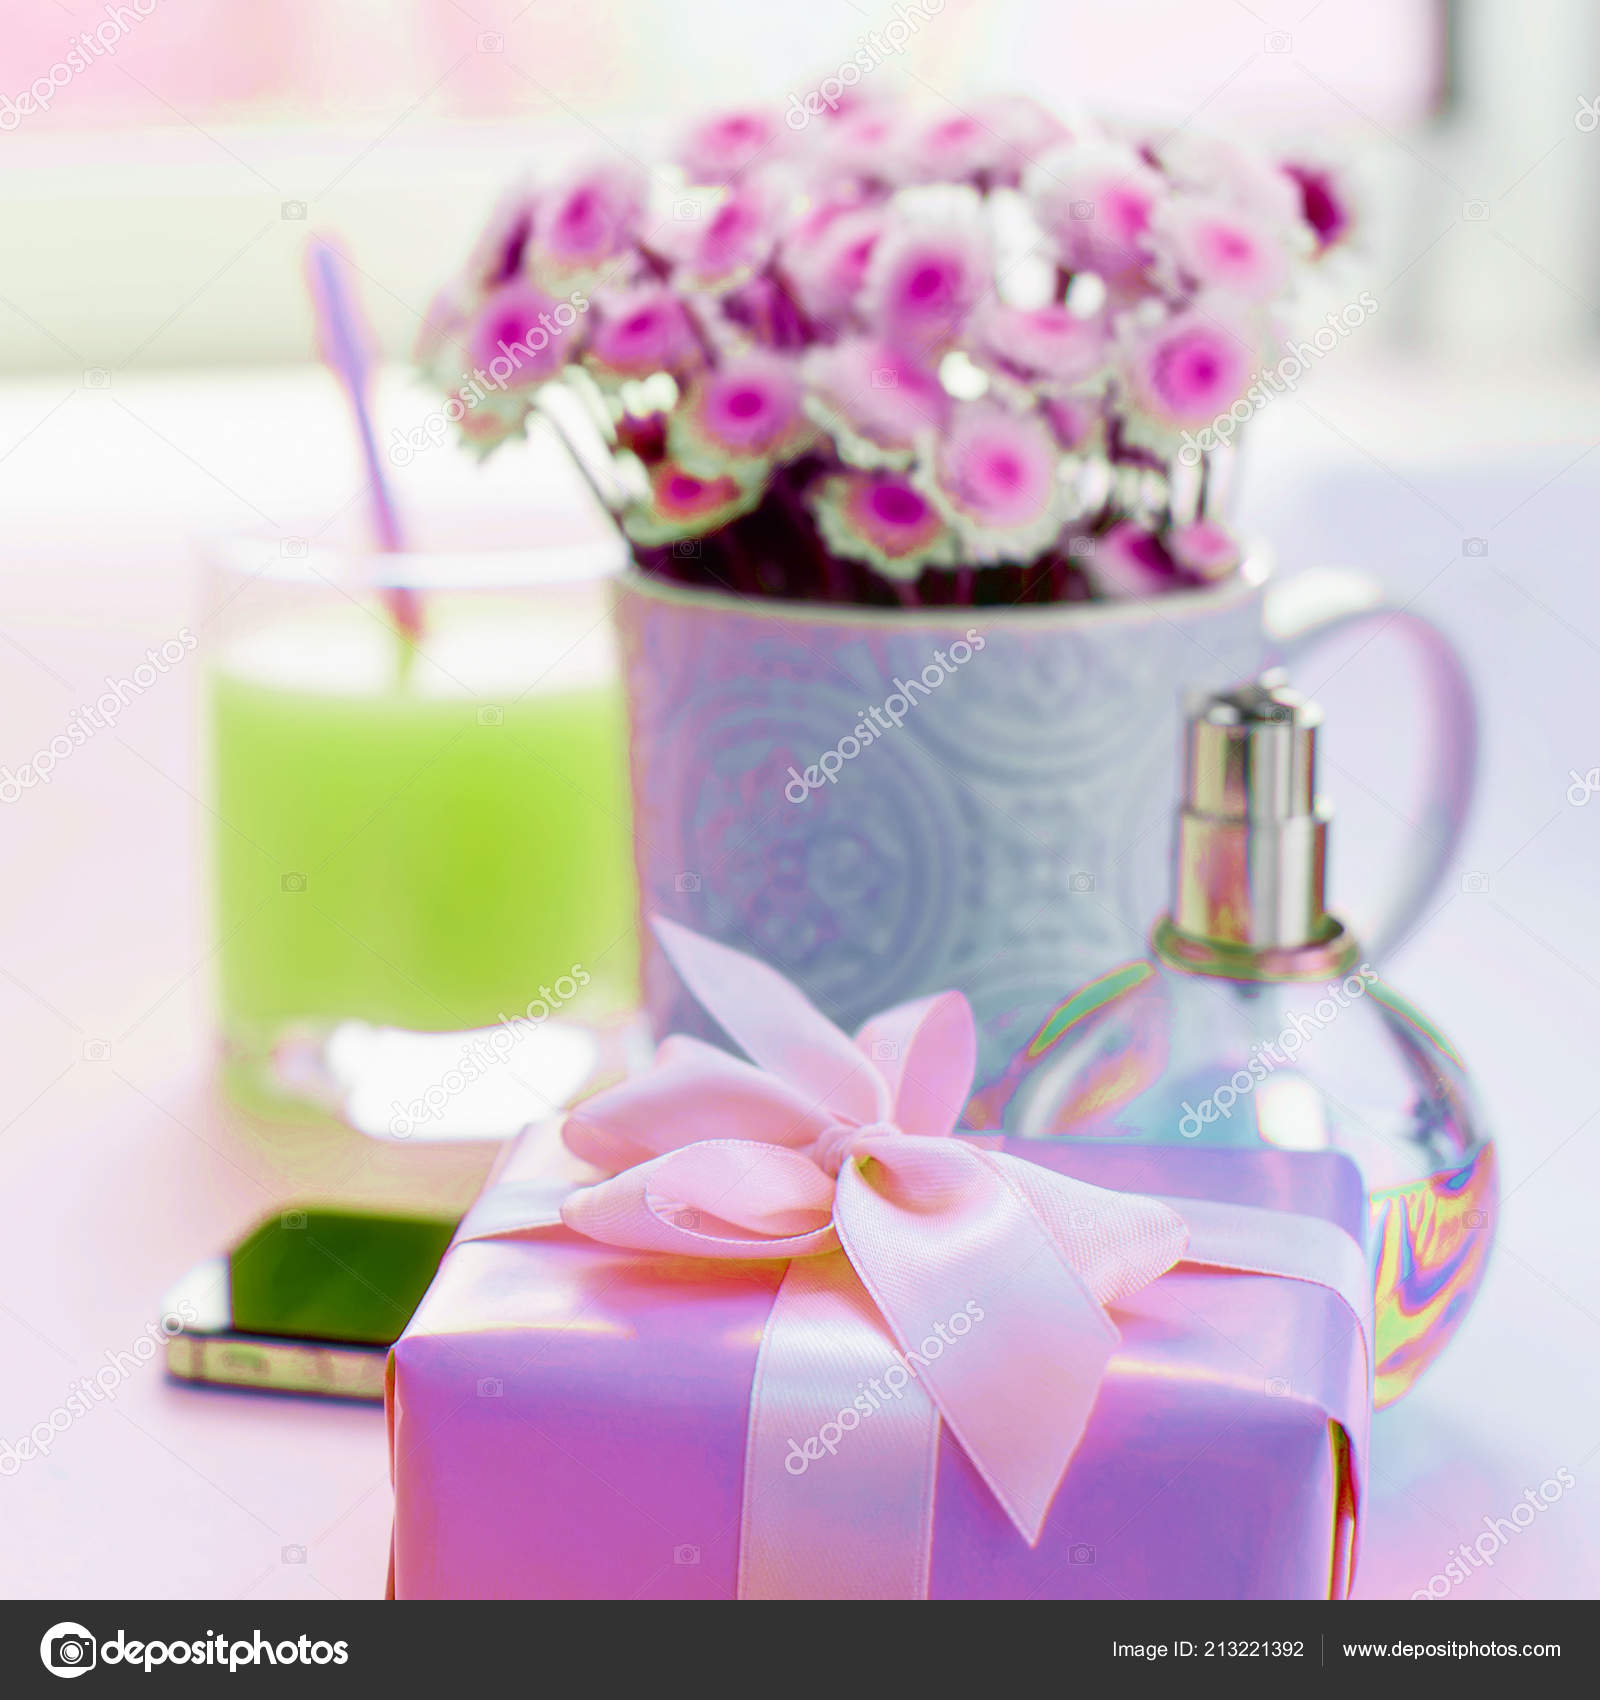 73d5f359071 Σουρεαλισμός Σύνθεση Επίπεδη Lay Δώρο Για Μια Γυναίκα Σύγχρονο ...